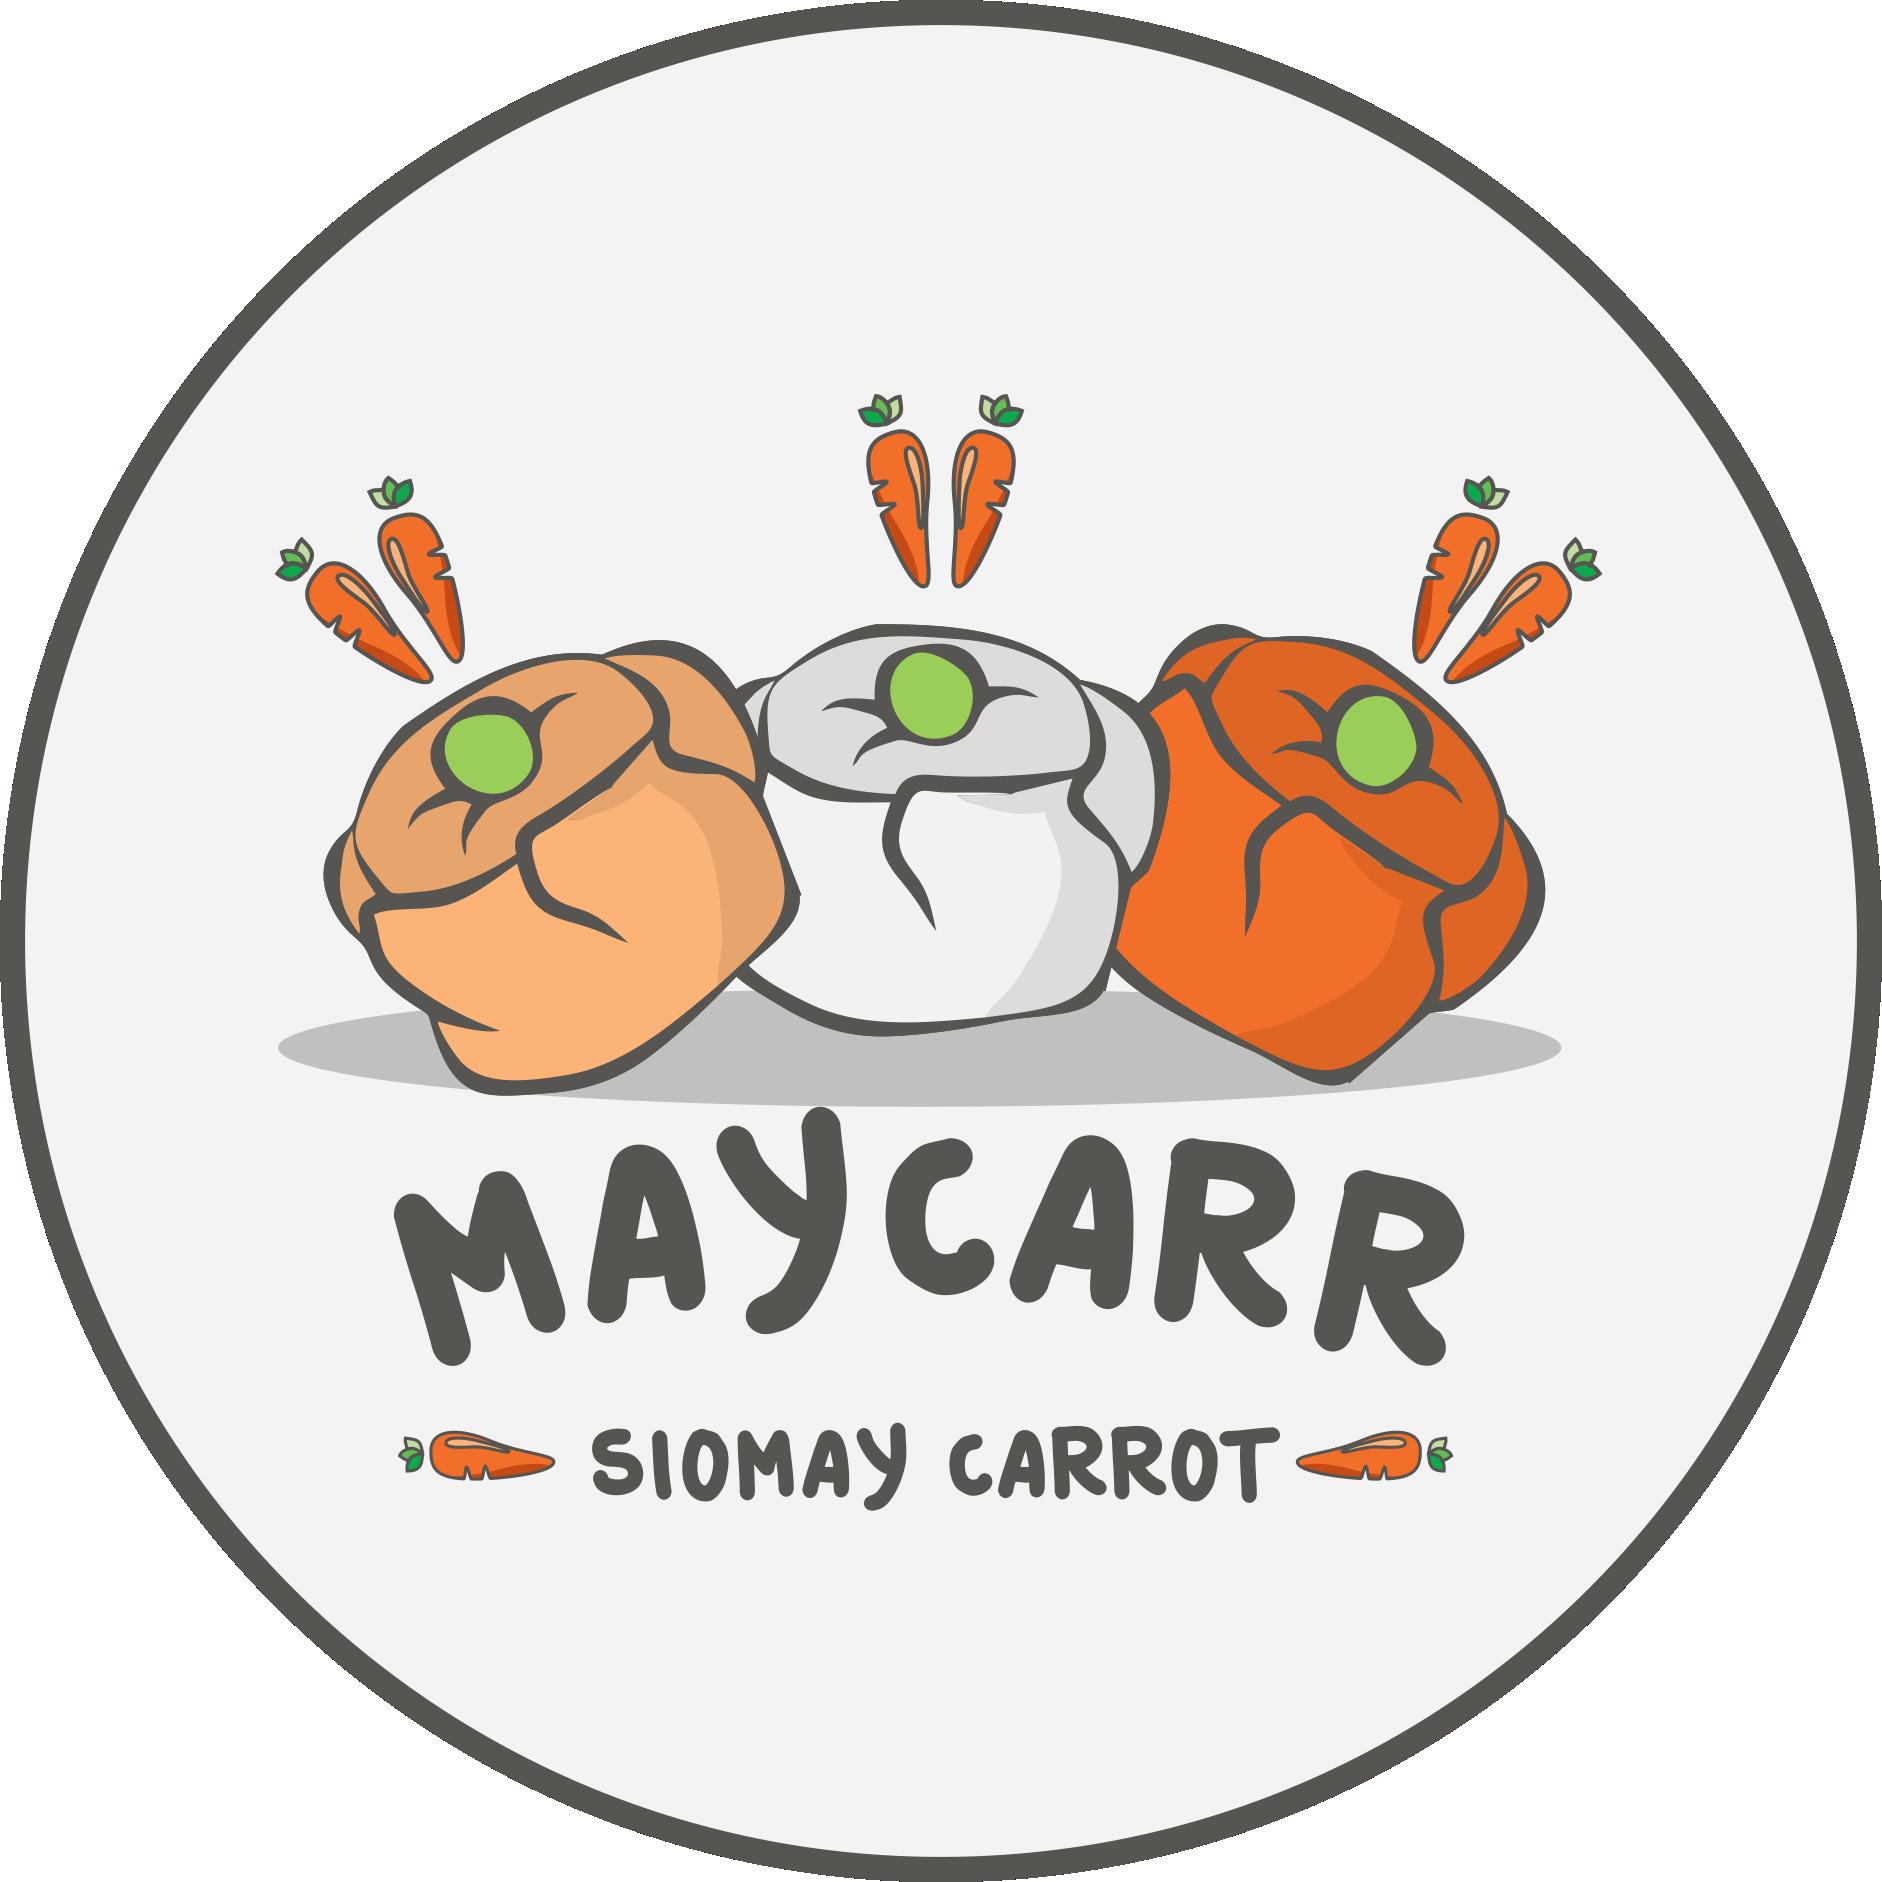 Logo Maycarr Fix (Siomay Carrot) (Dengan gambar) Desain